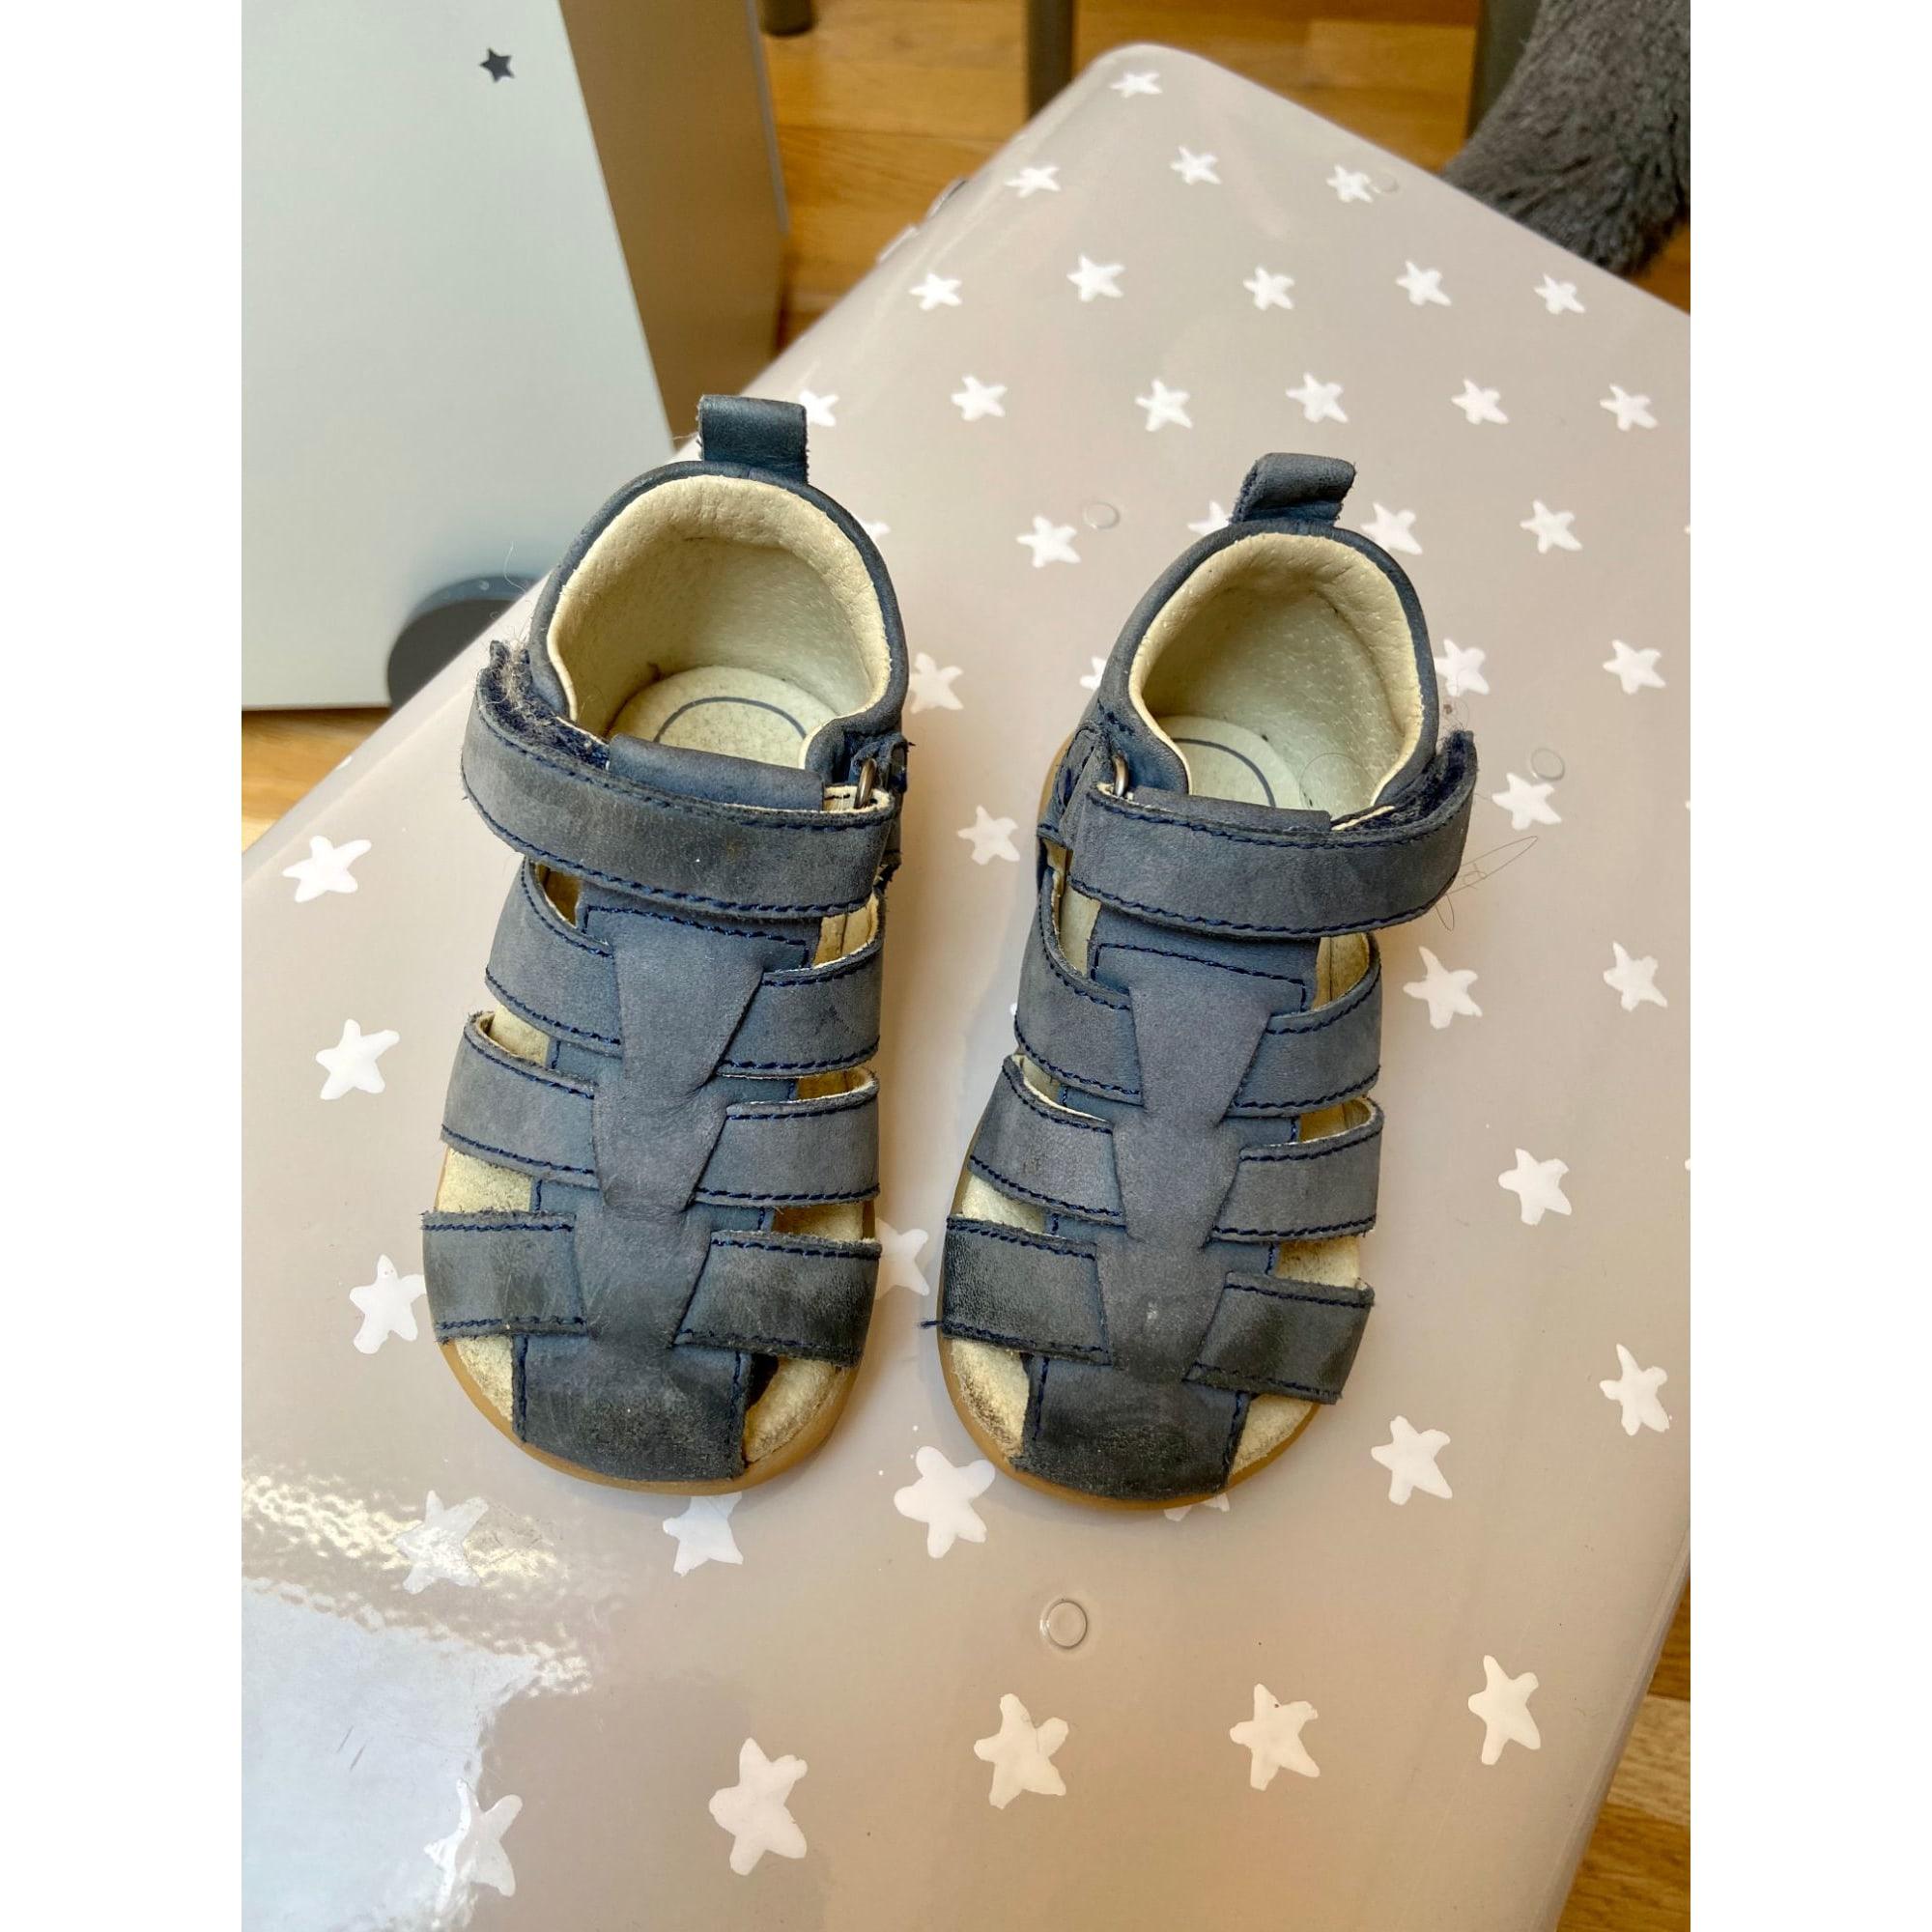 Sandales VERTBAUDET Bleu, bleu marine, bleu turquoise